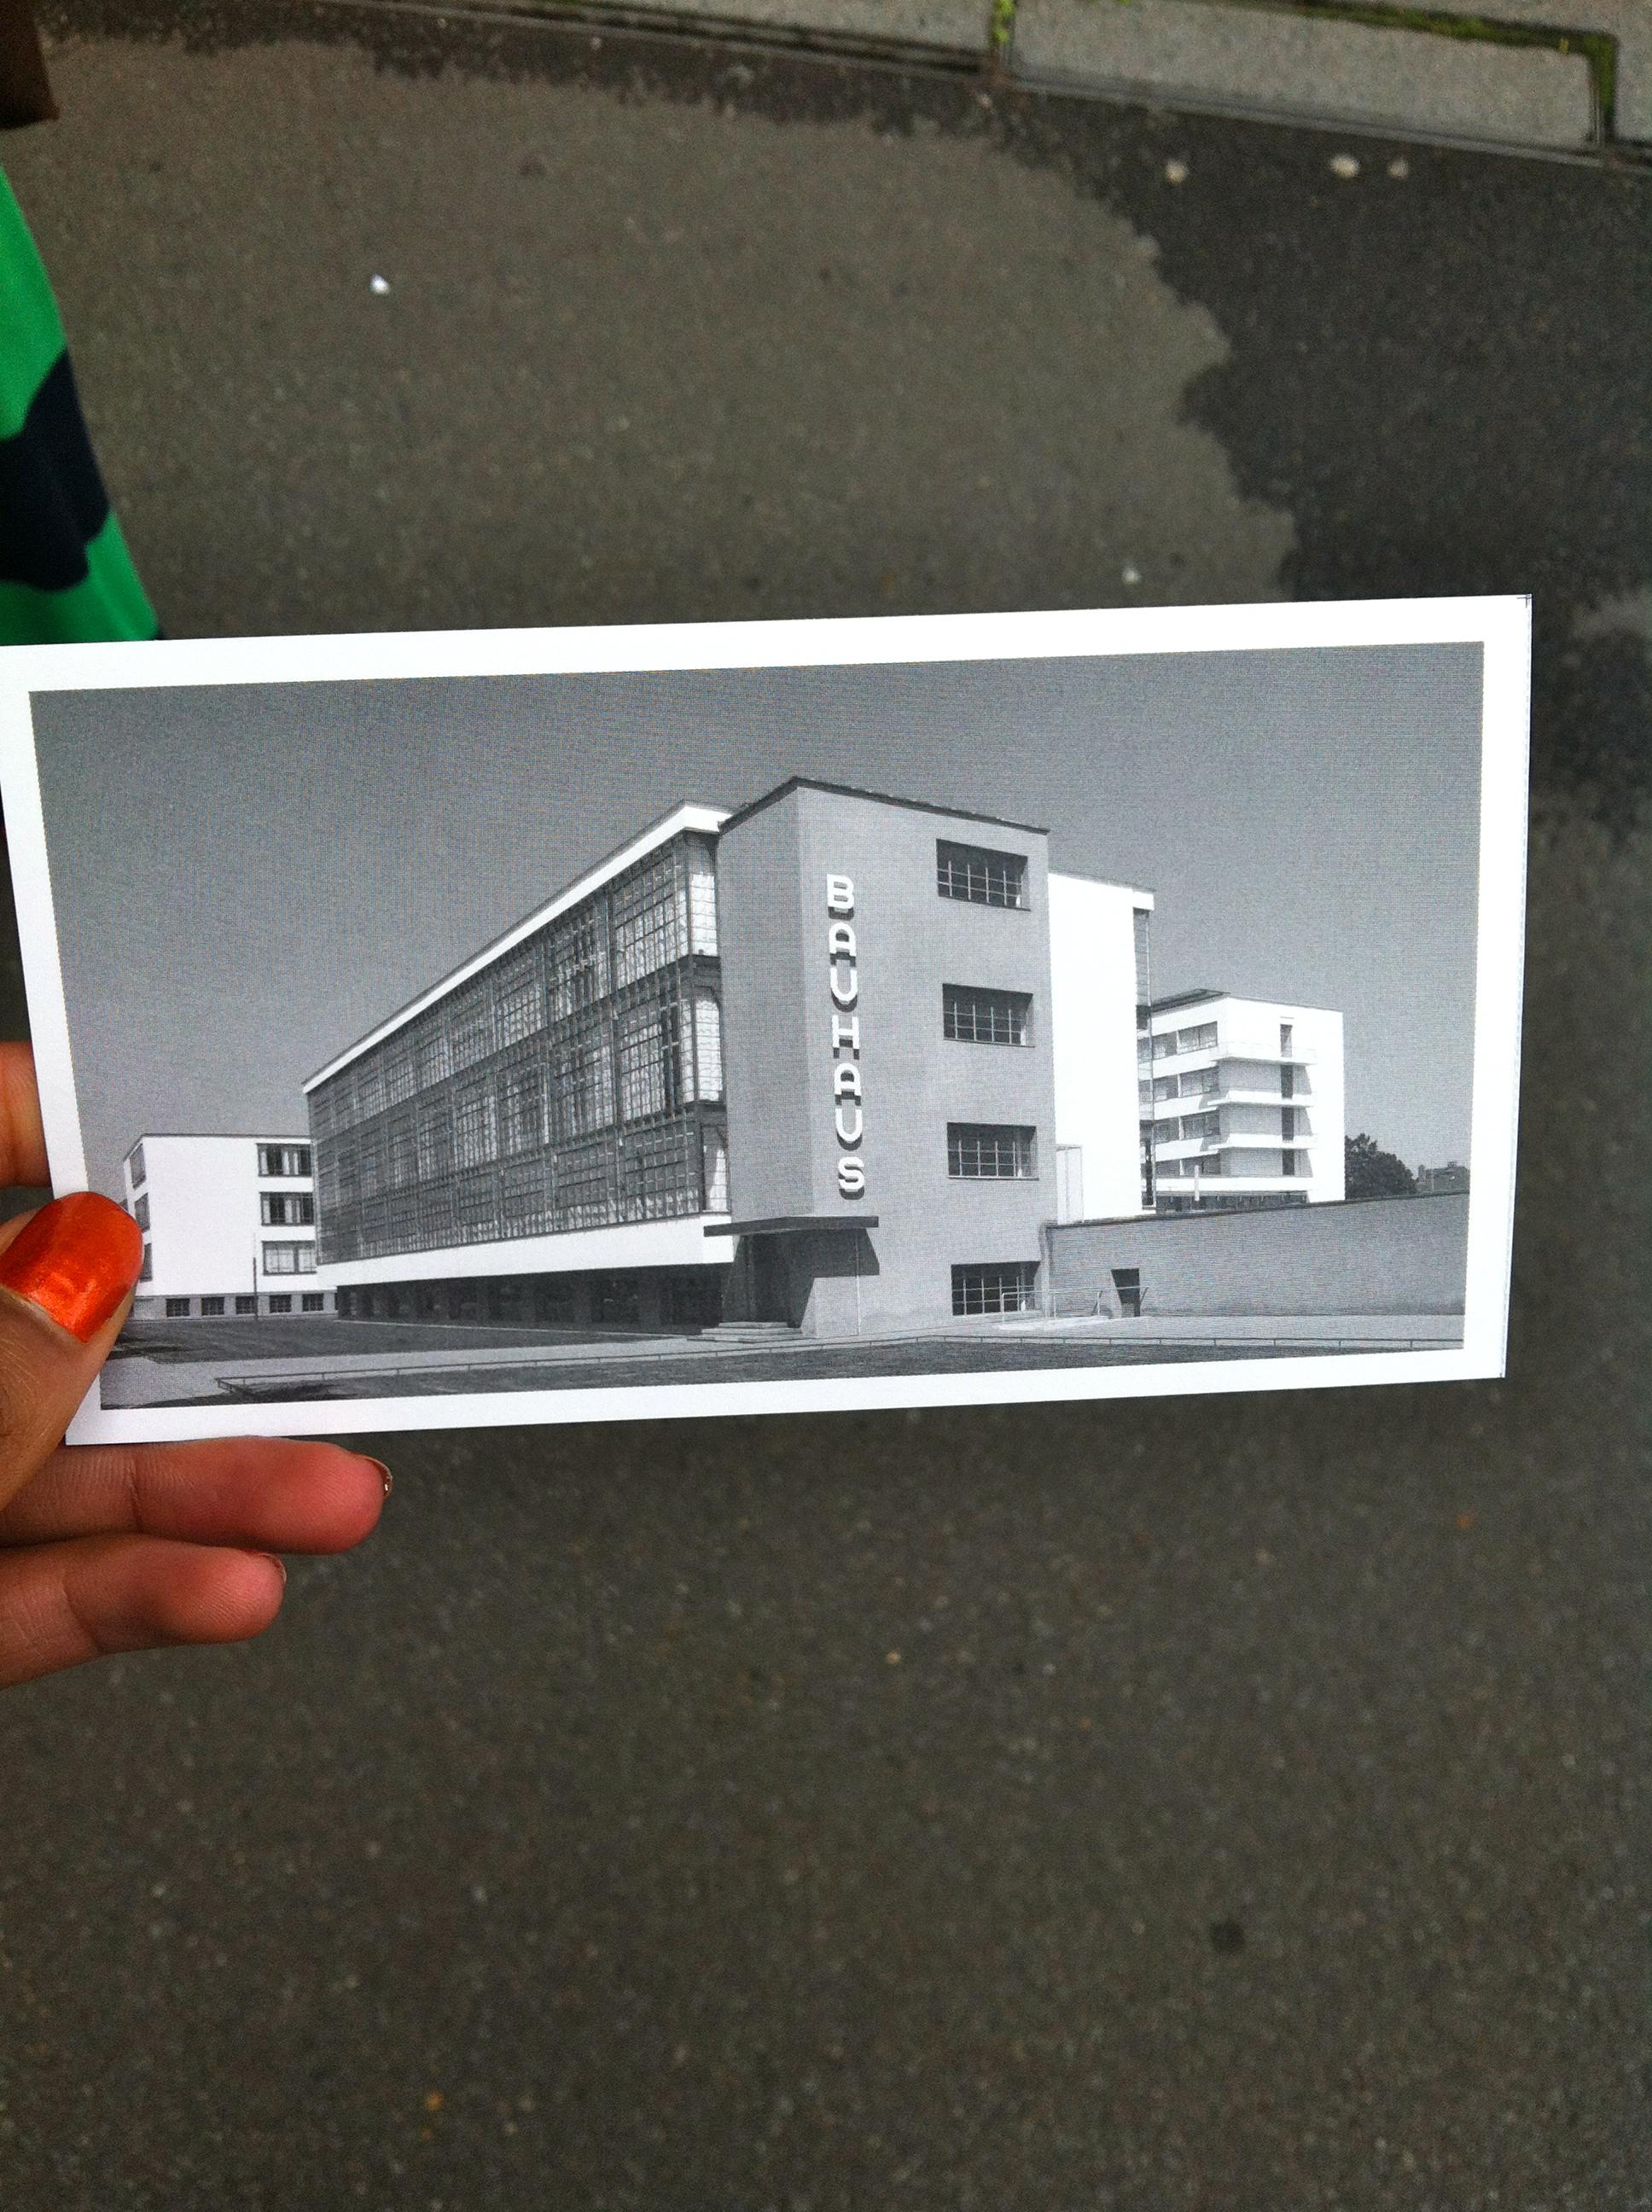 BauHaus Postcard